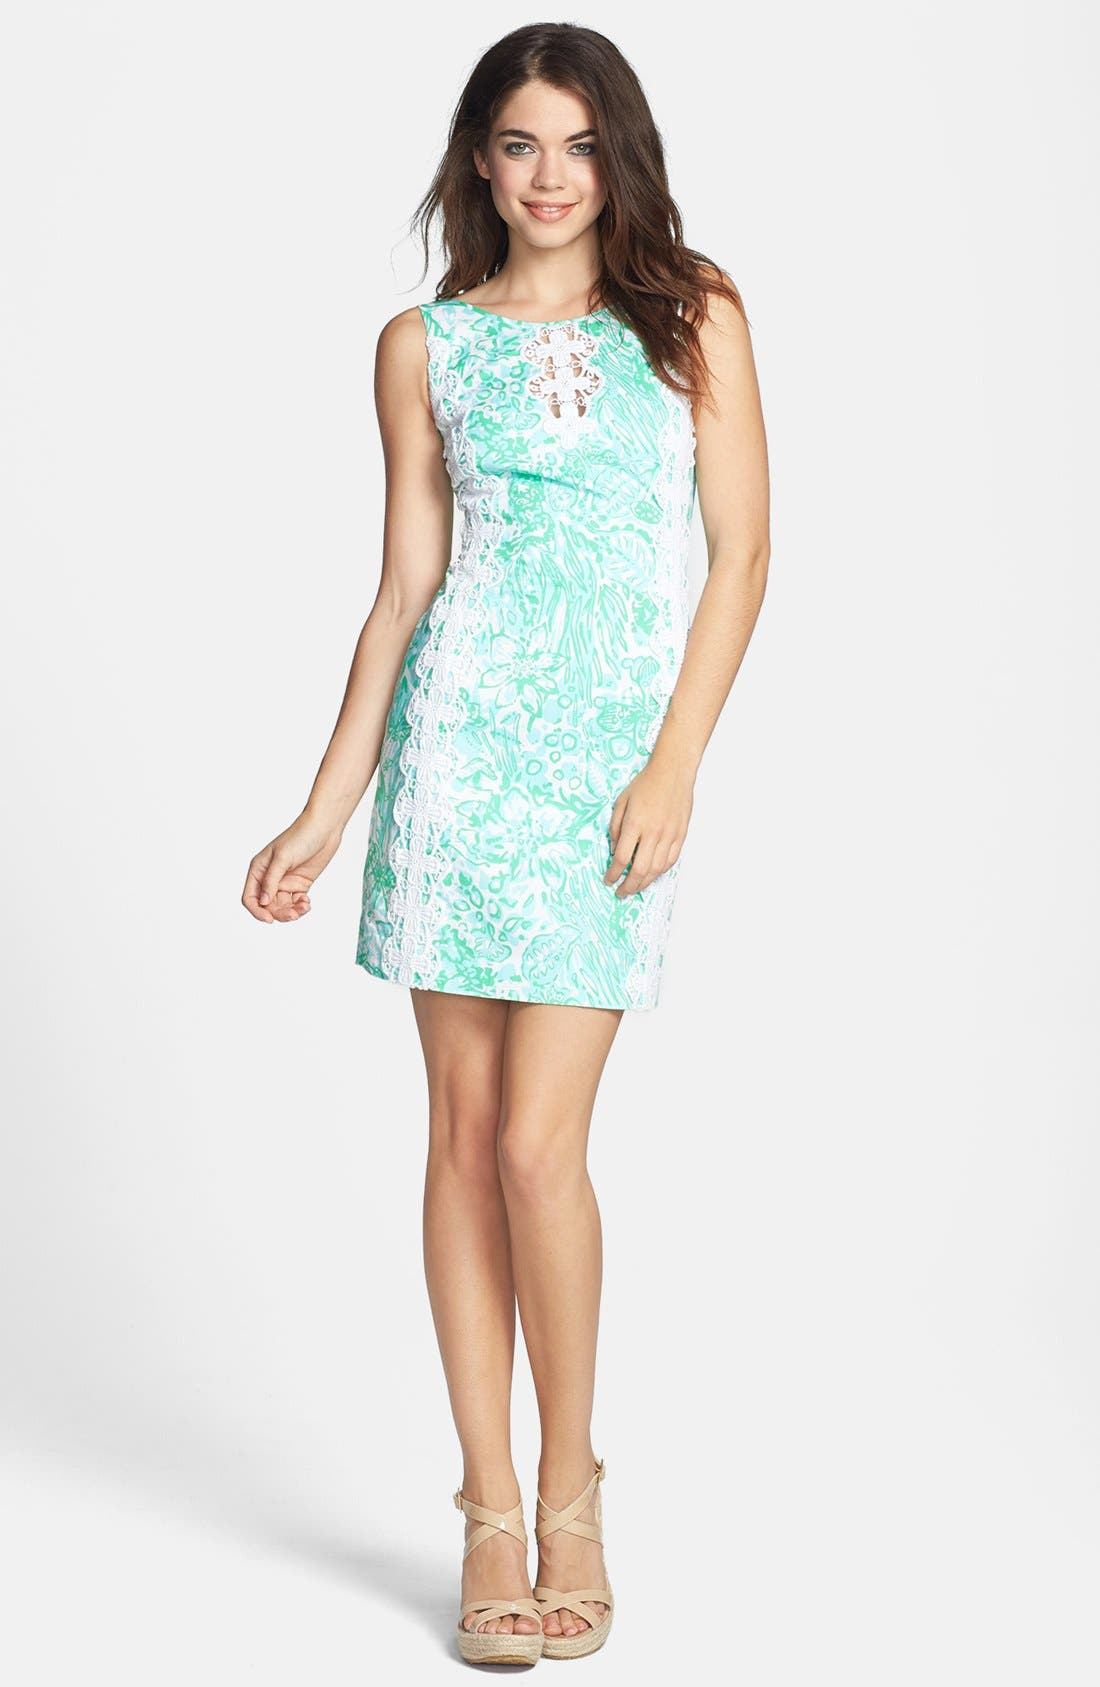 Main Image - Lilly Pulitzer® 'Ember' Lace Trim Print Twill Dress